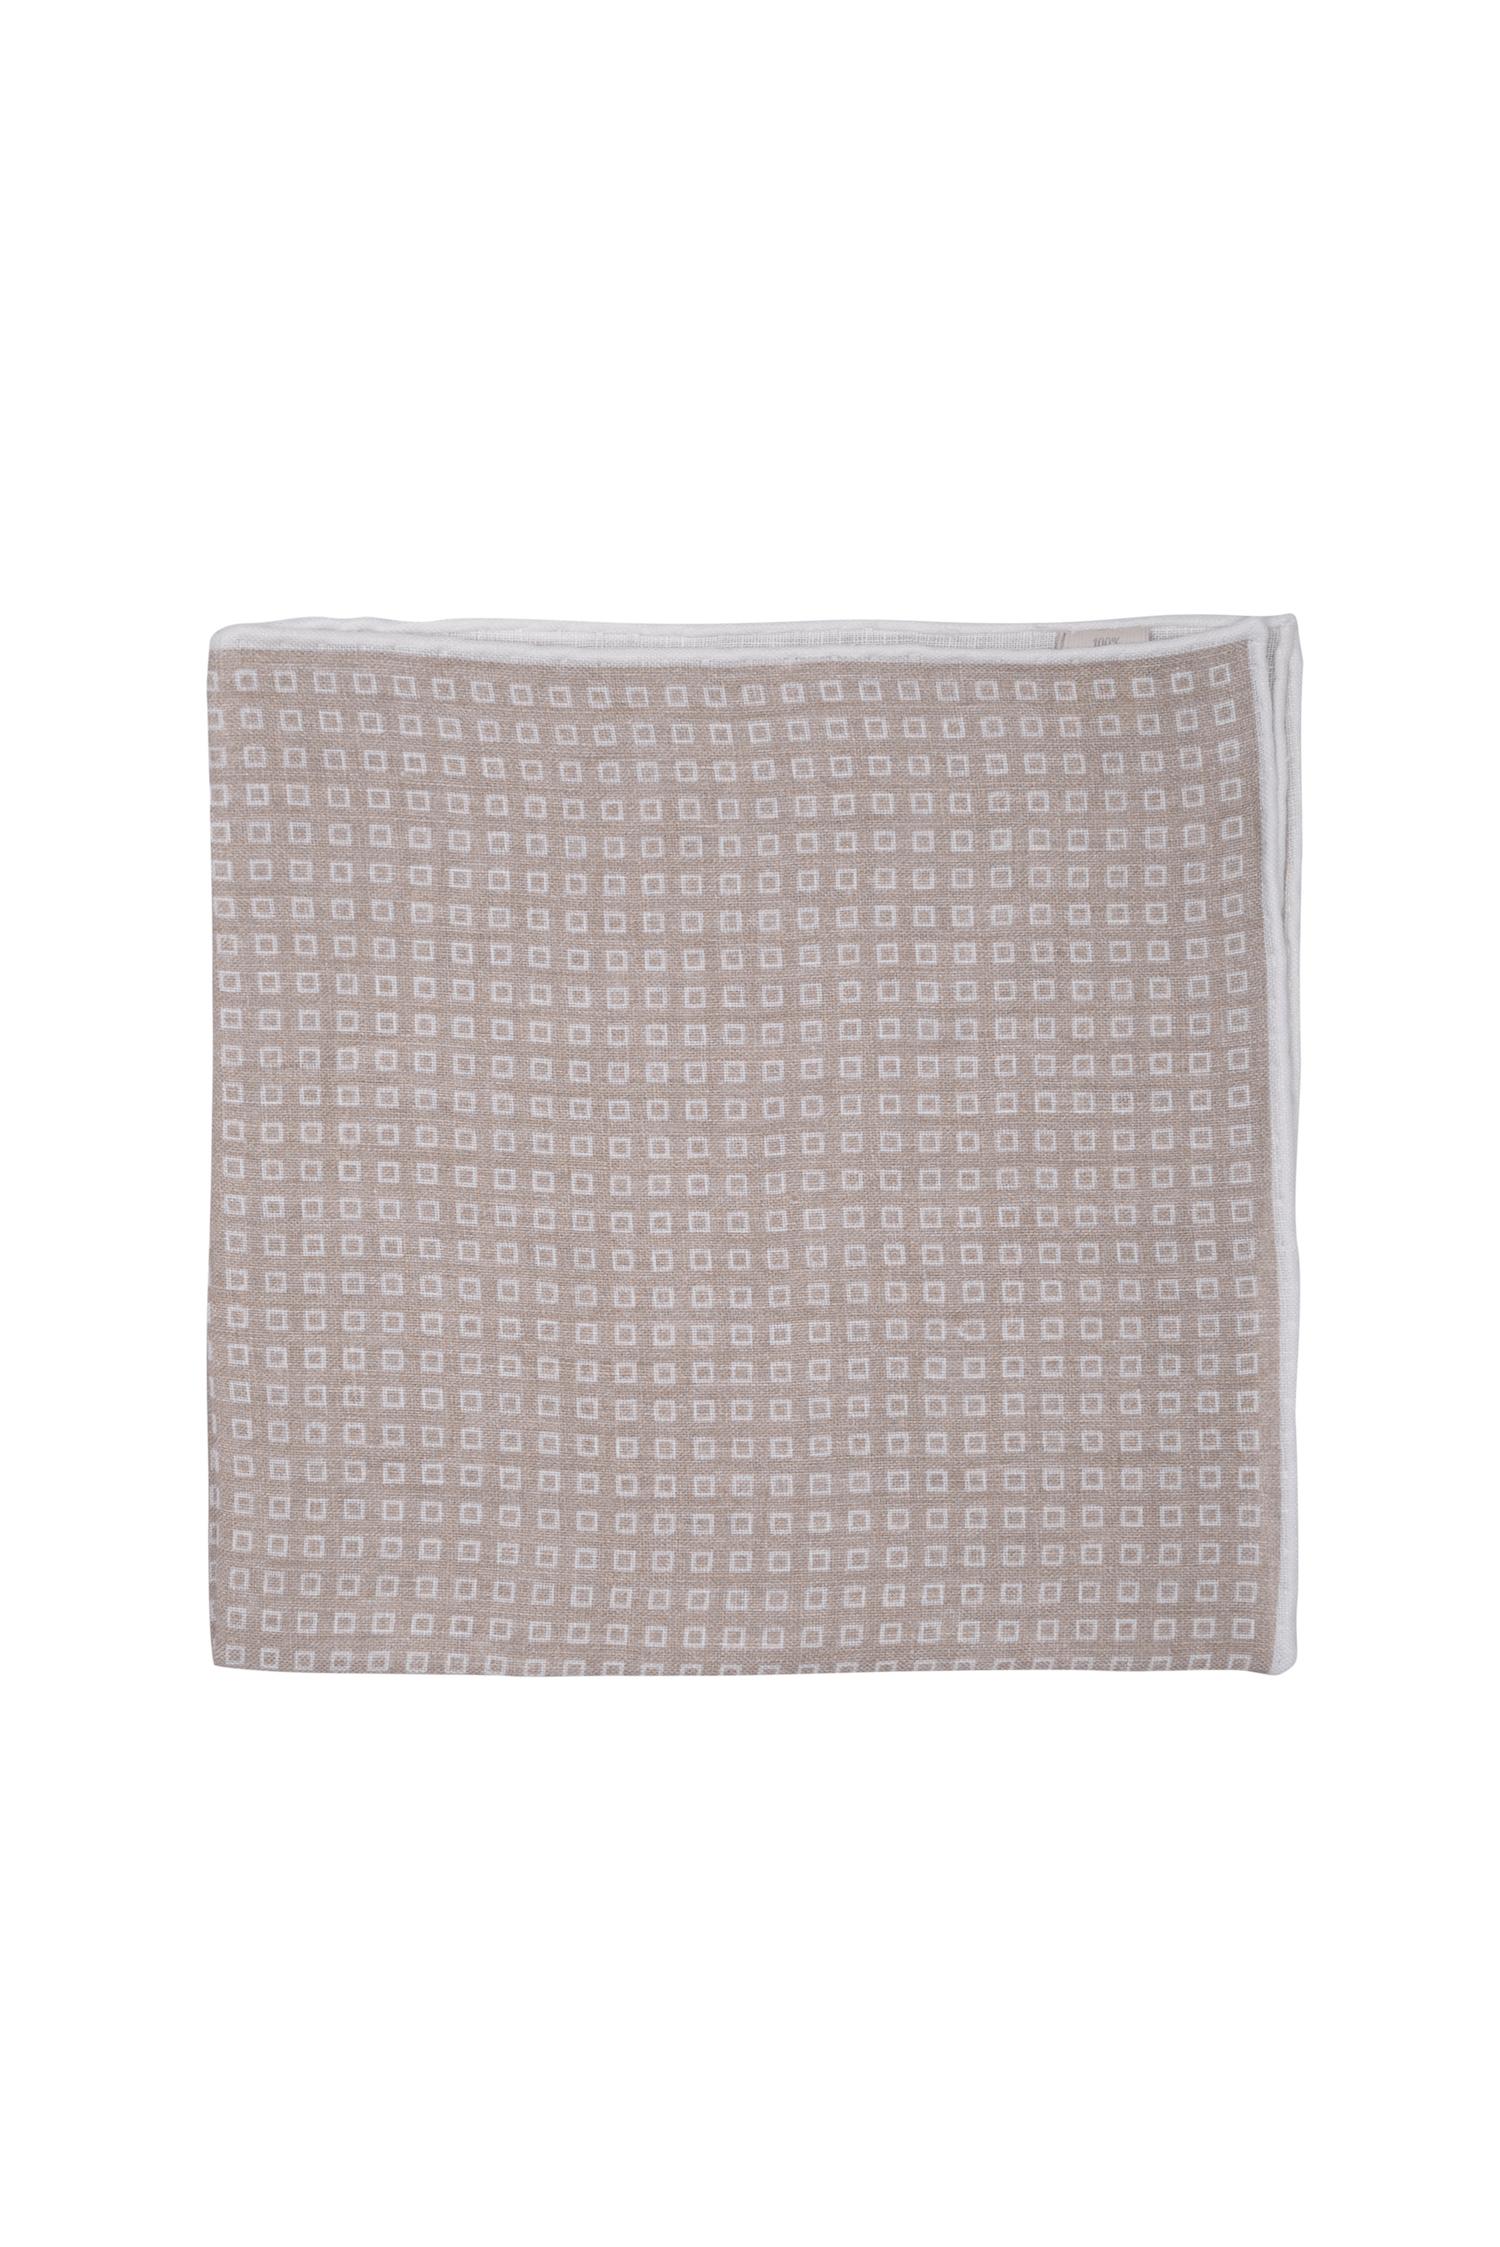 Pochette motif fenêtres en lin – beige blanc   Cadot bdb5590526b